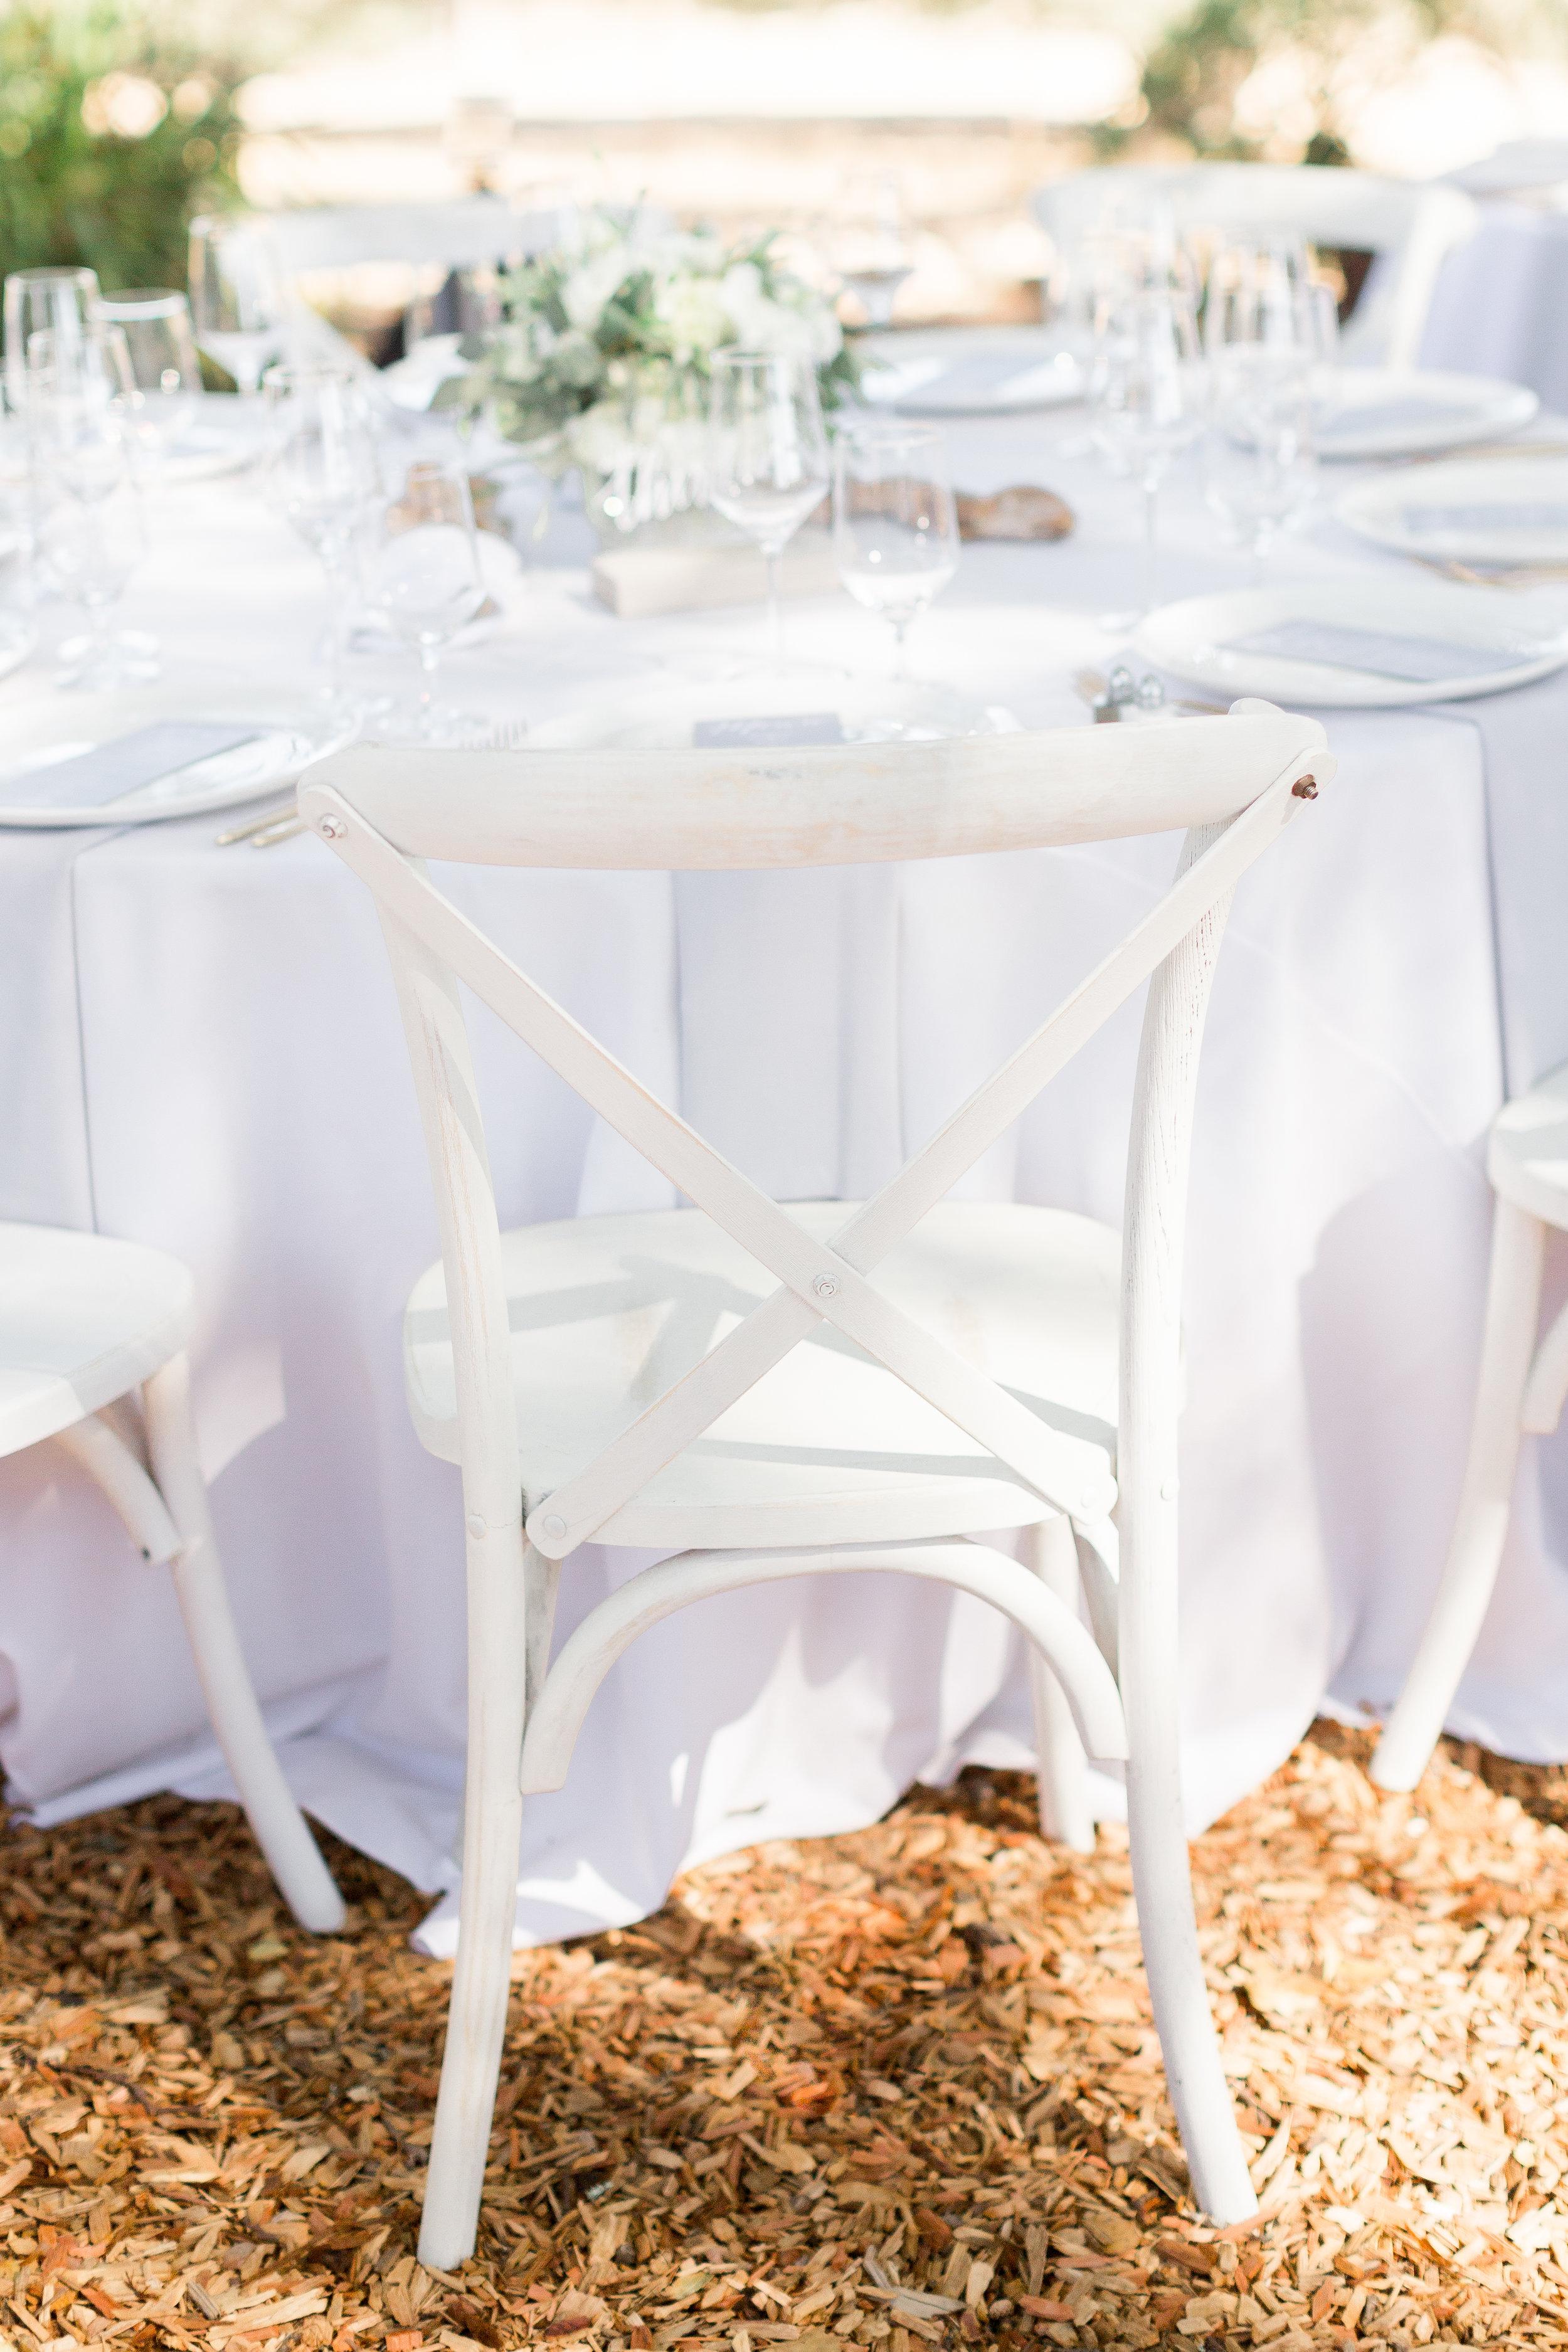 Calegari-Vineyards-Healdsburg-Wedding-Photographer (2 of 4).jpg